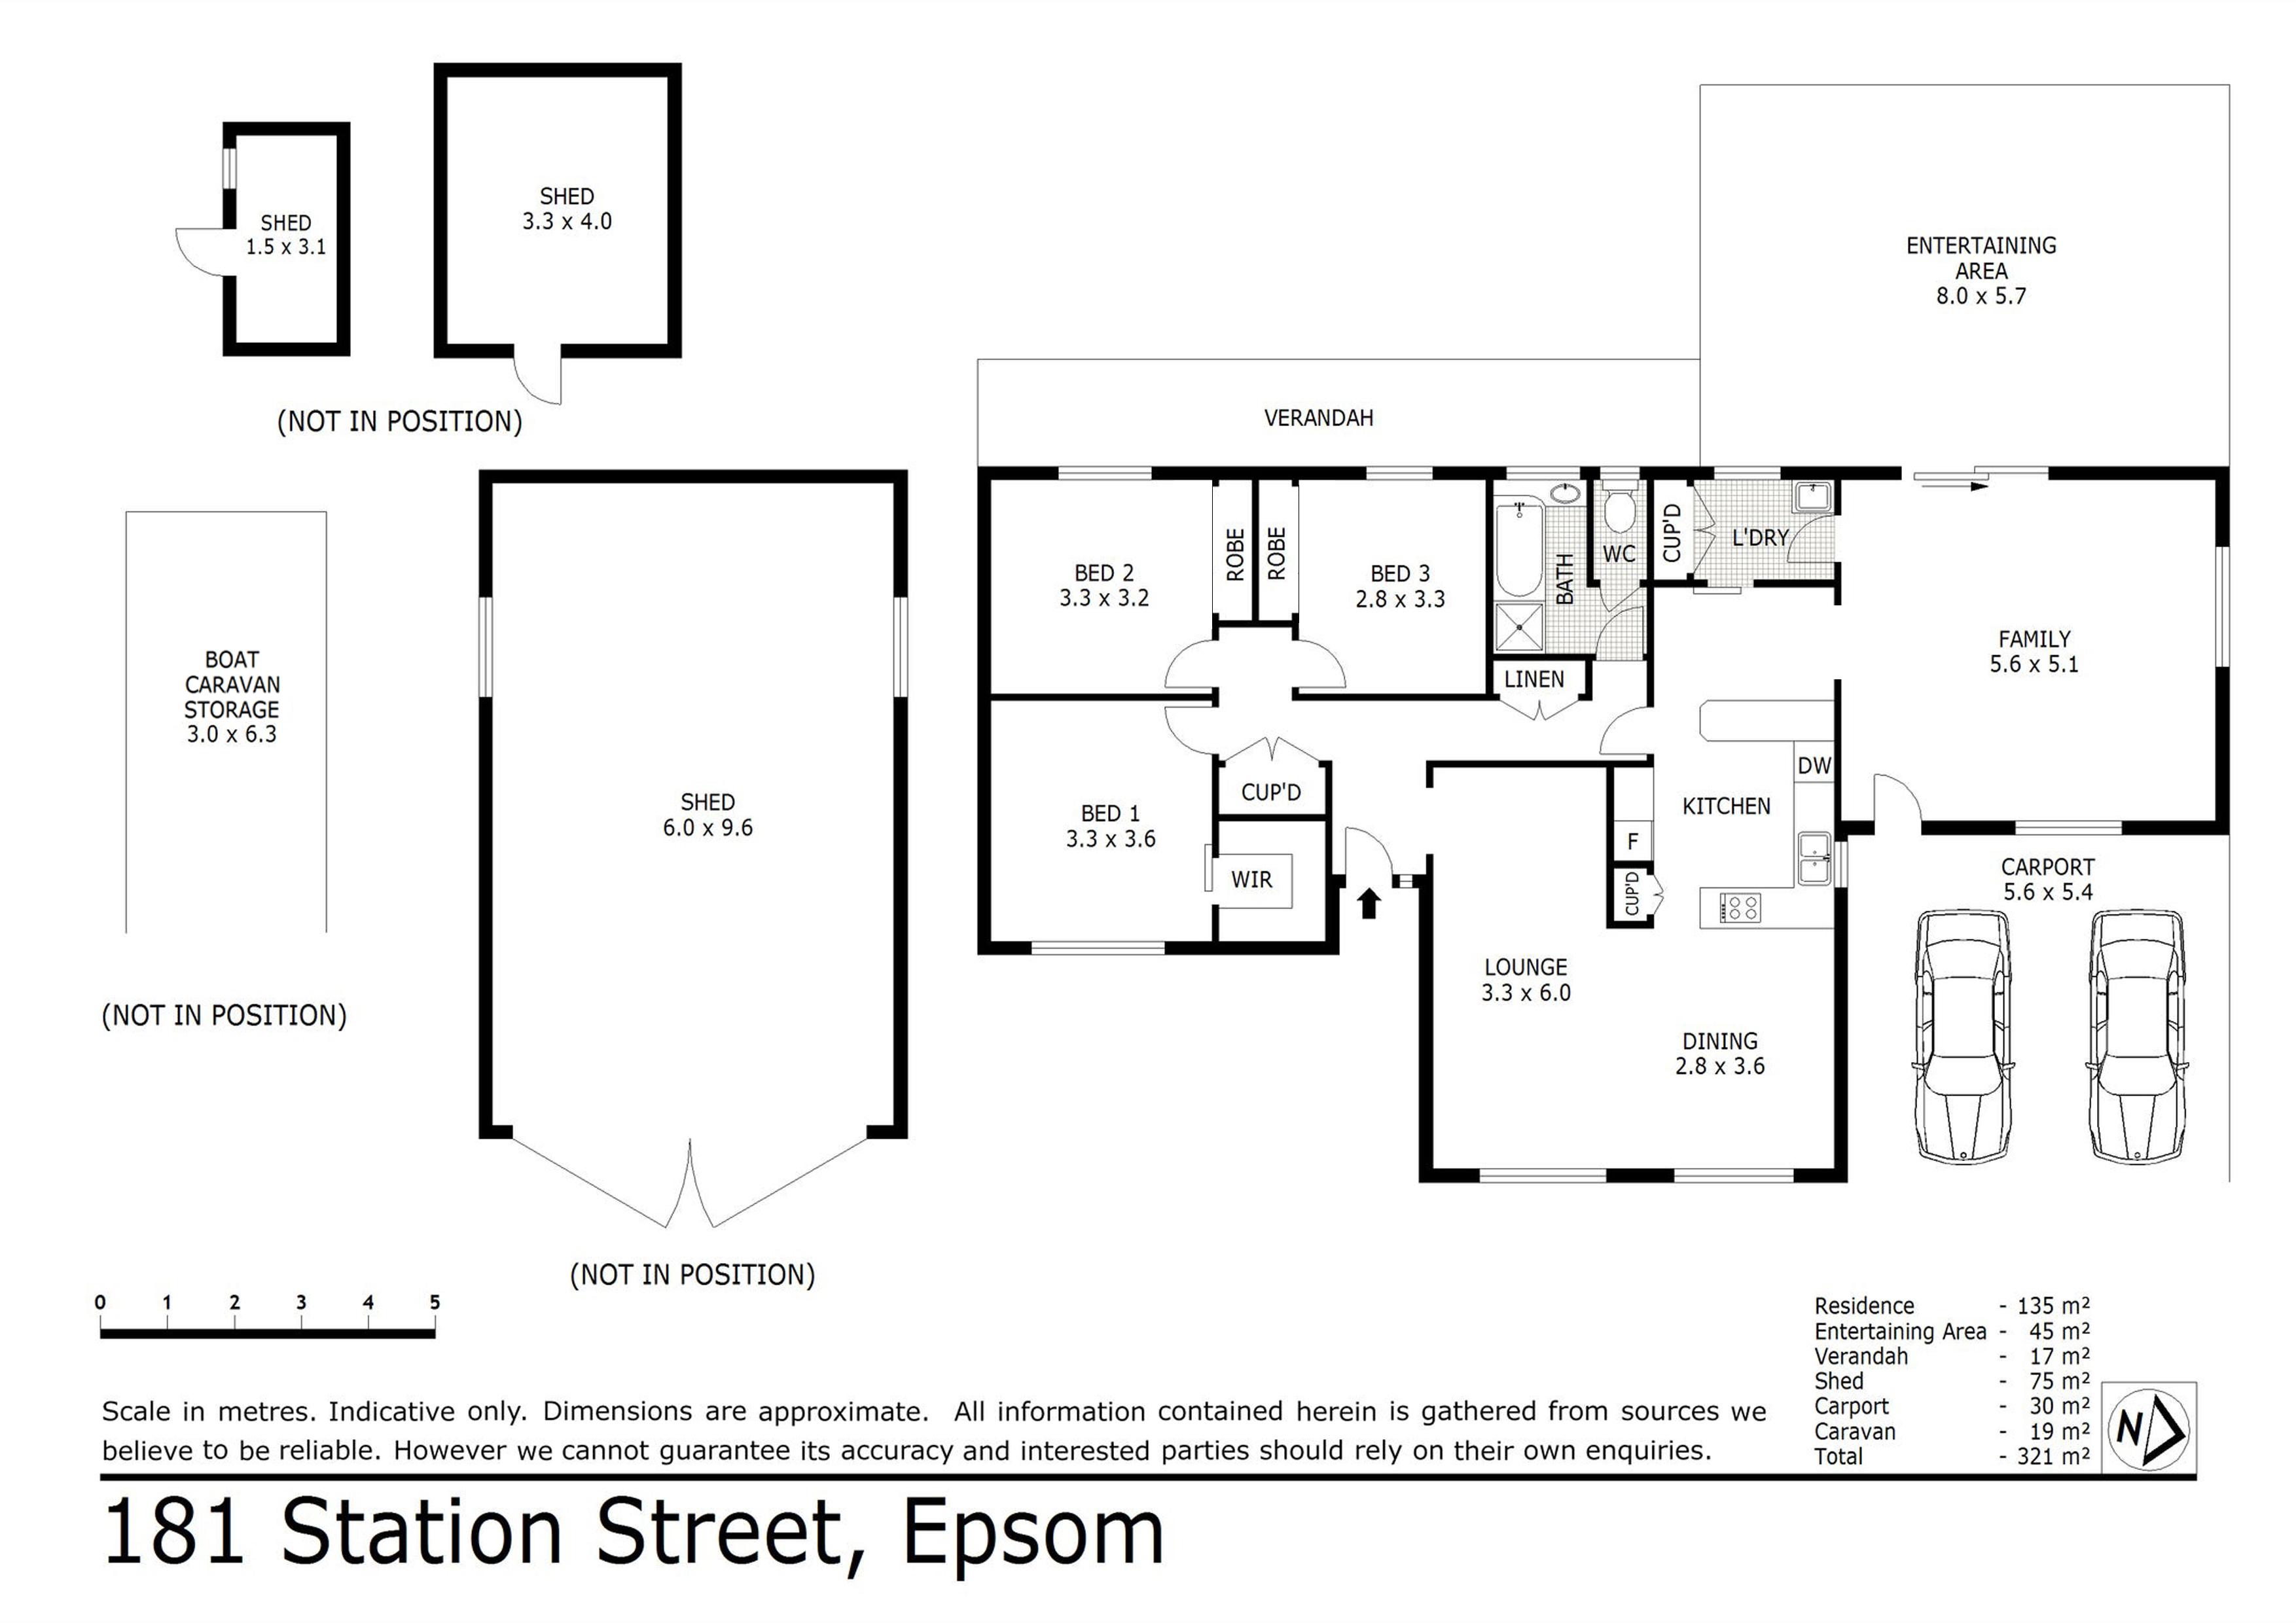 181 Station Street, Epsom, VIC 3551